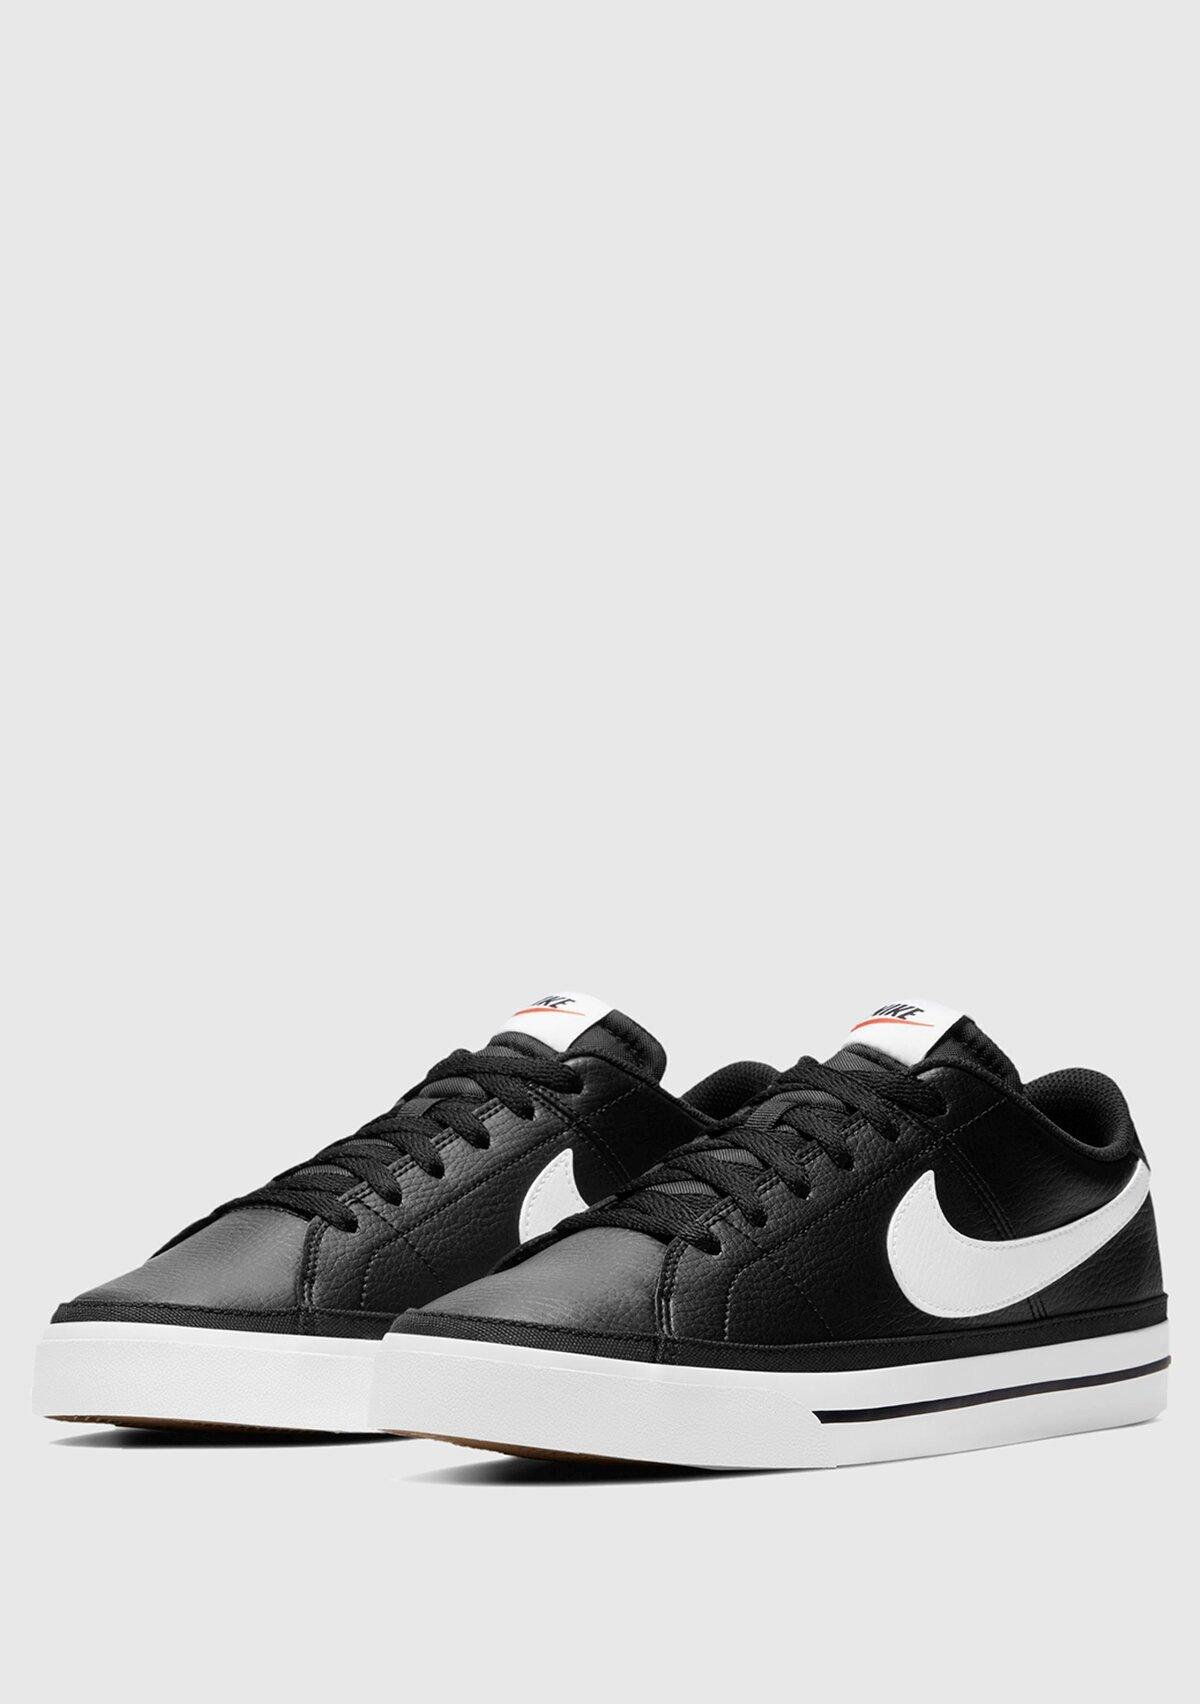 resm Court Legacy Siyah-Beyaz Erkek Sneaker Cu4150-002